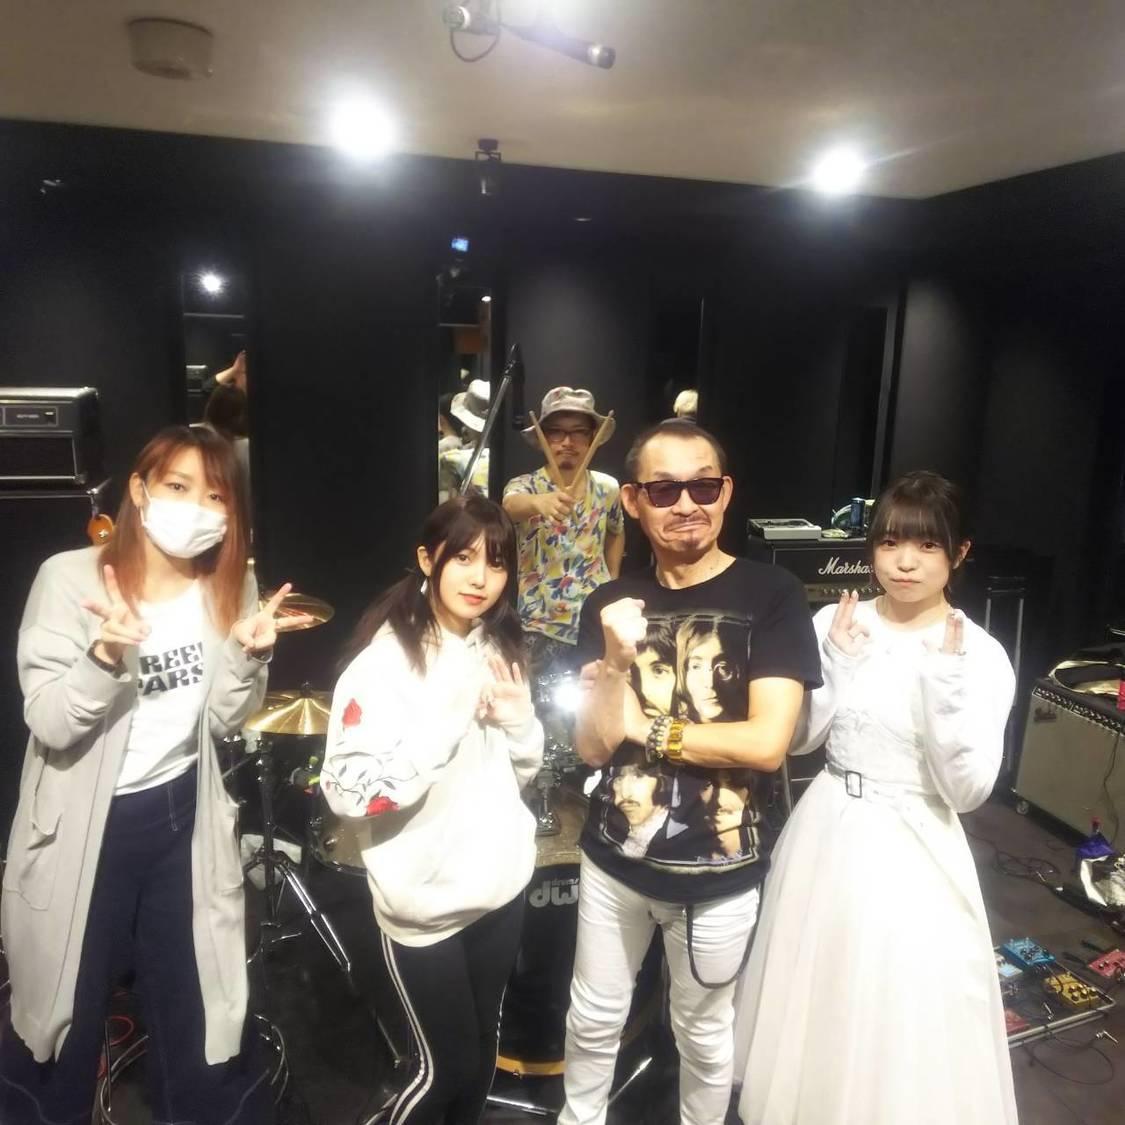 CHERRY GIRLS PROJECT 来瞳舞夢、九瀬いむ、バンドメンバー参加の高橋まこと(元BOØWY)からコメント到着!ワンマン目前